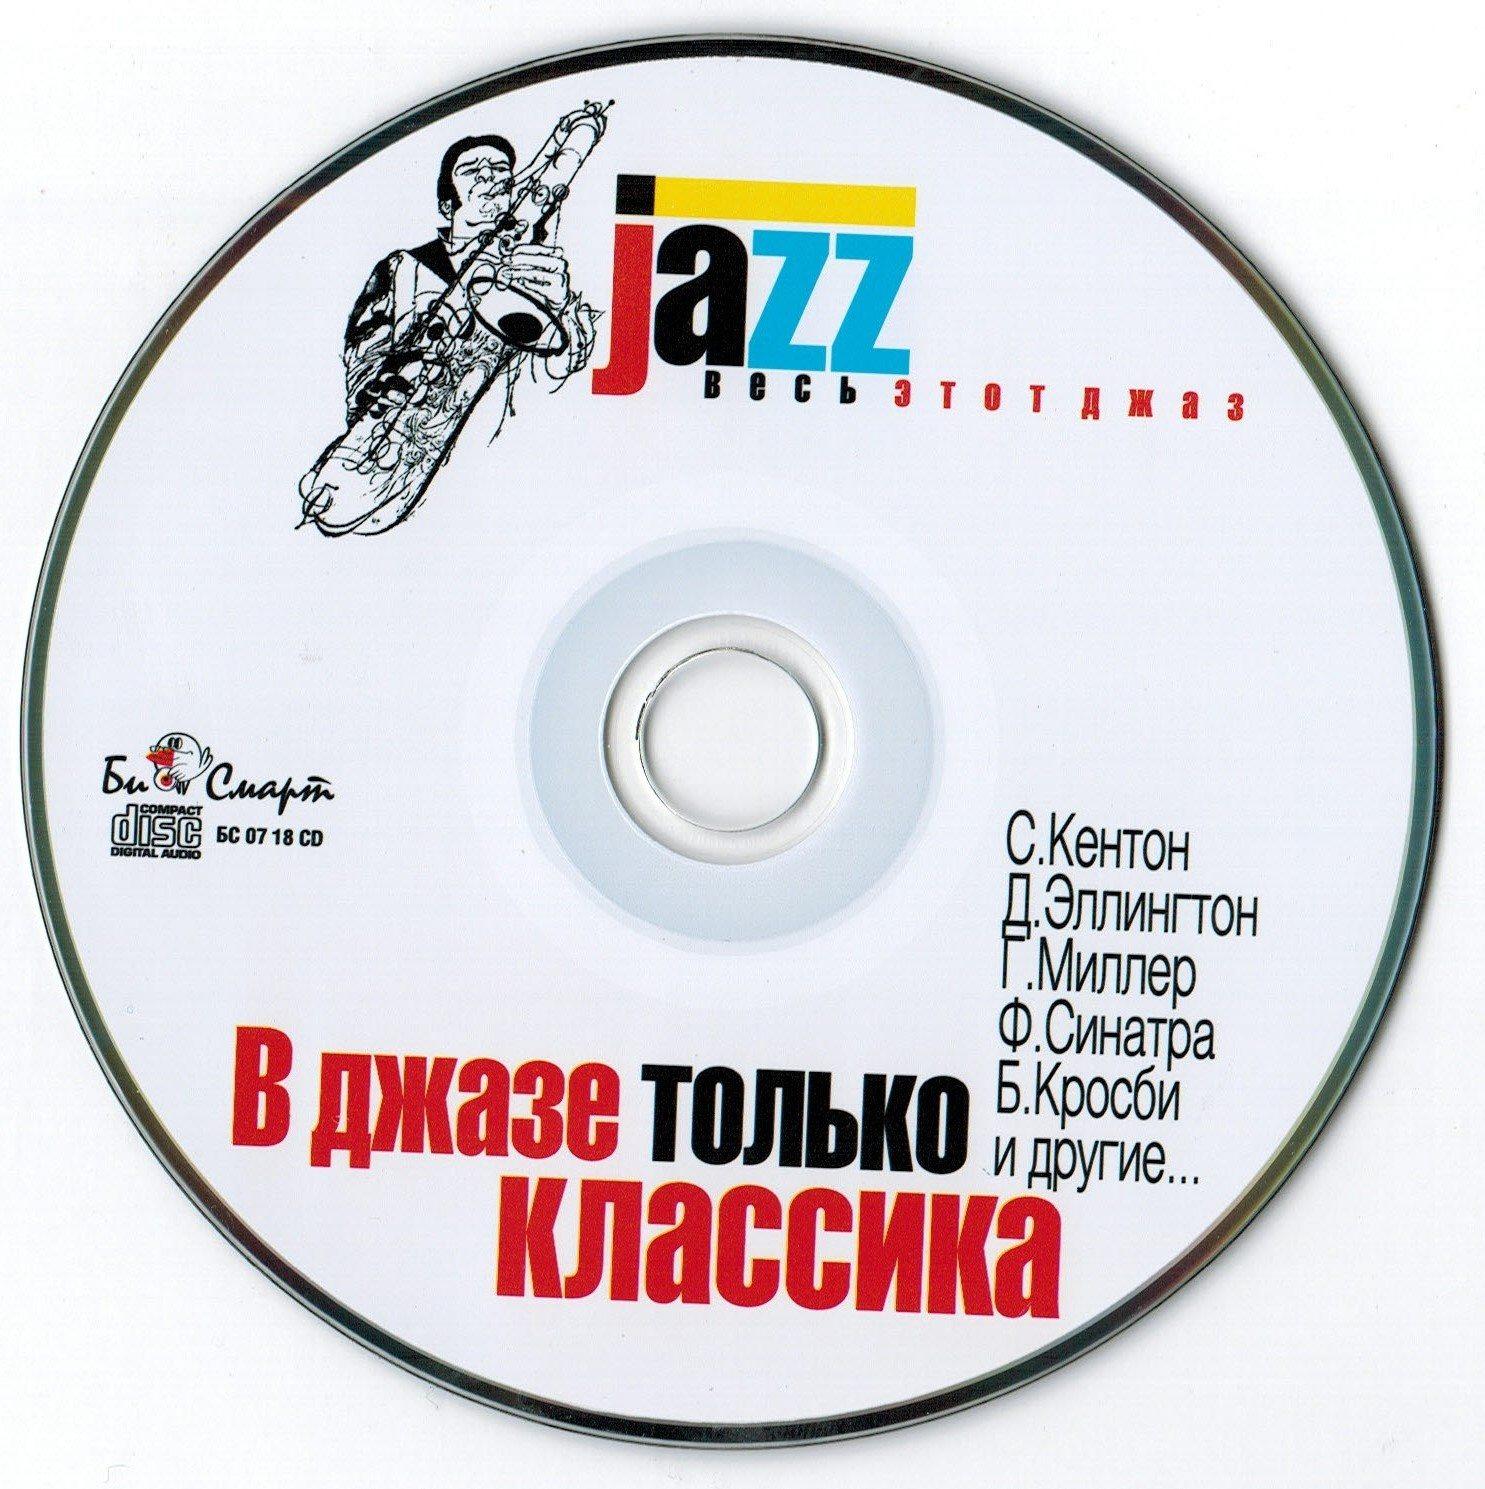 http://i5.imageban.ru/out/2014/10/16/b344cbe16b3dee2a995d6b81a918f64b.jpg